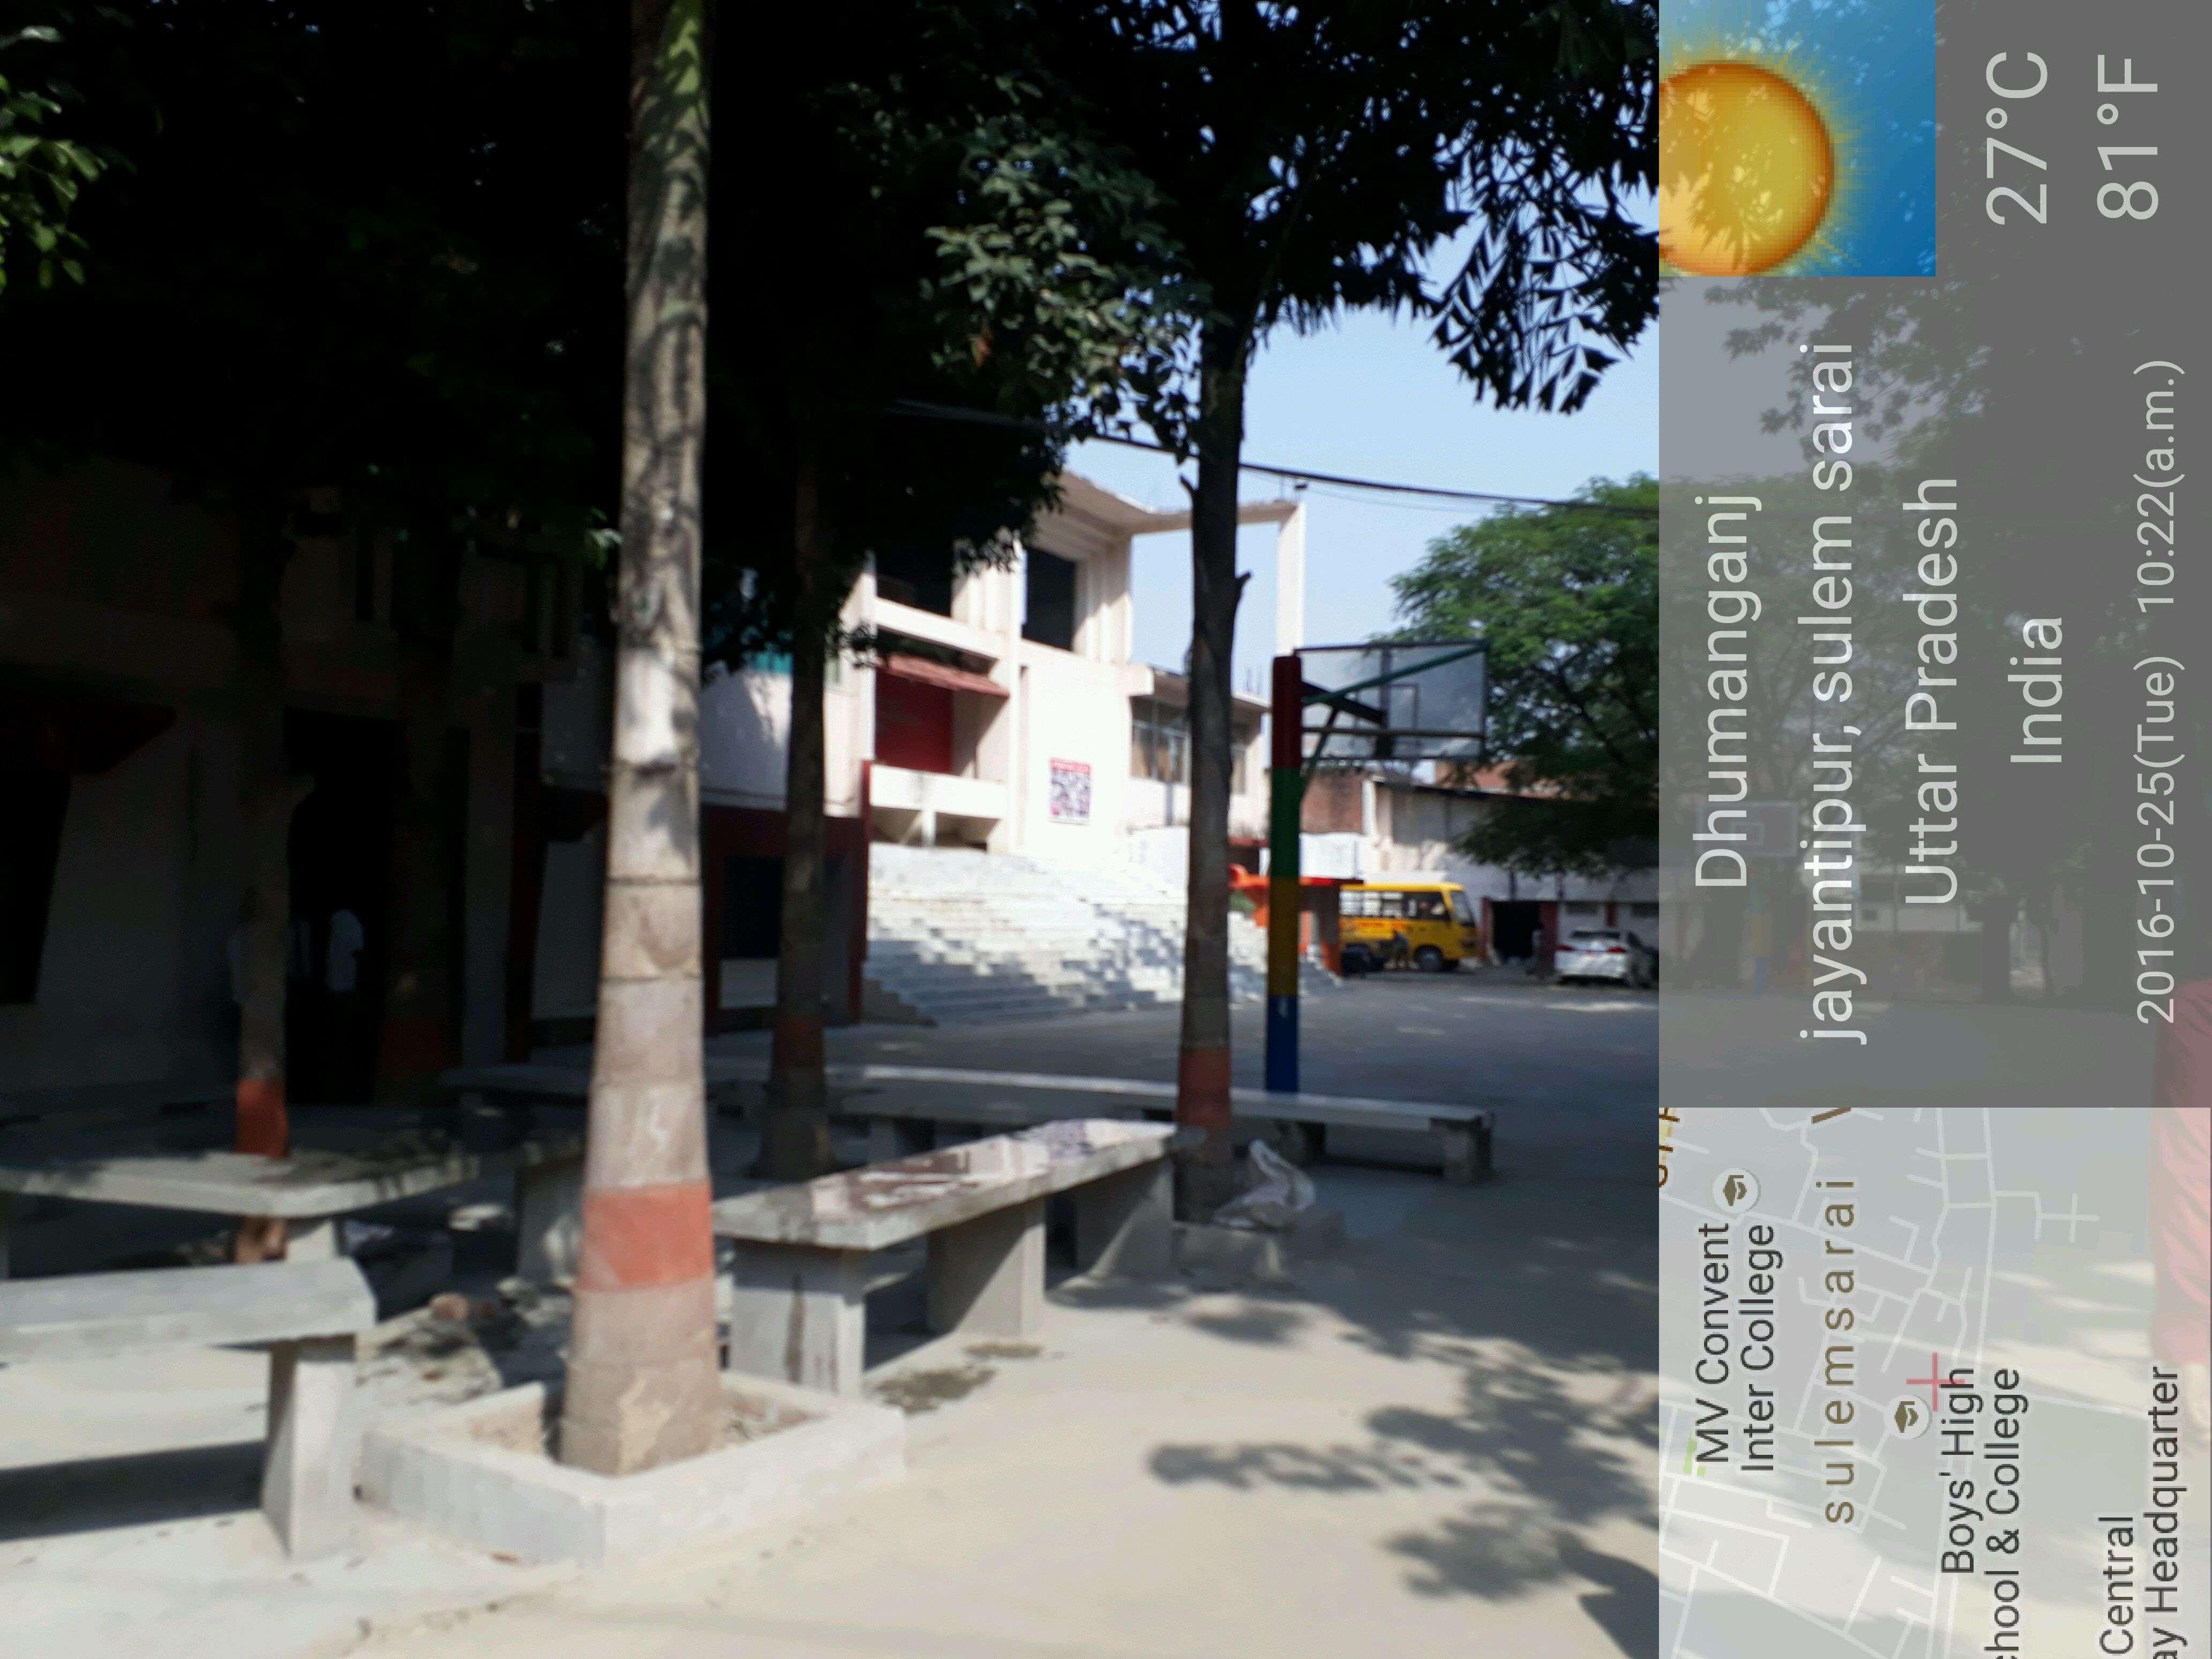 SANSKAAR INTERNATIONAL SCHOOL SULEM SARAI ALLAHABAD UP 2130782